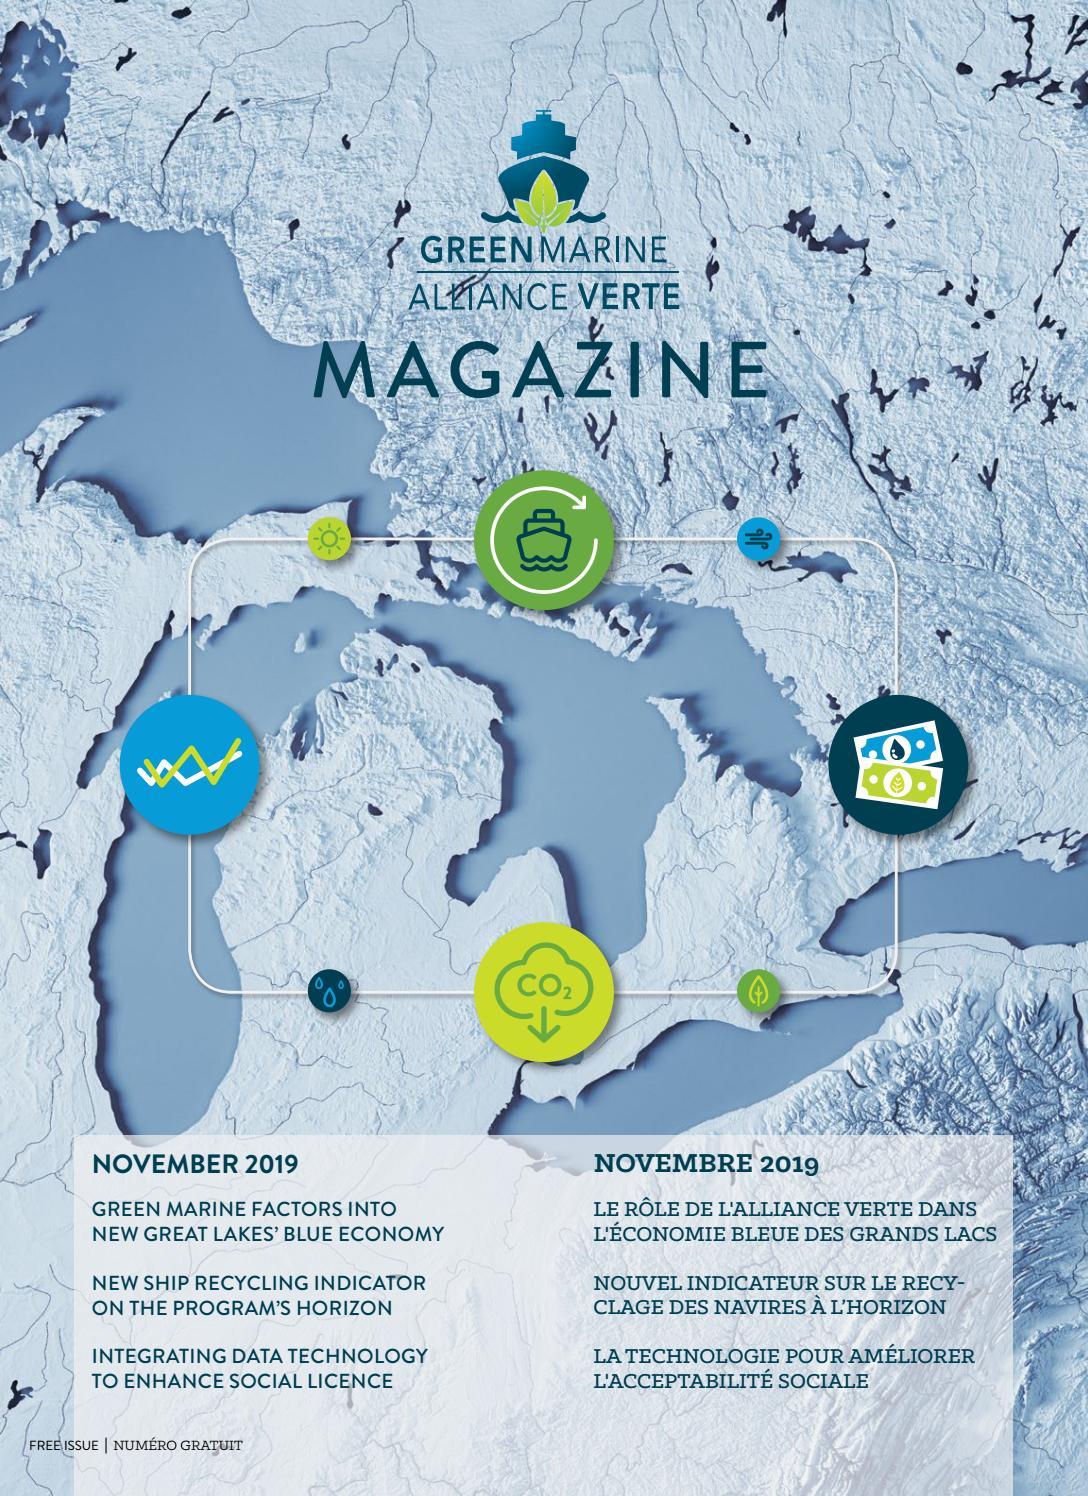 Restaurant Americain Plan De Campagne green marine magazine de l'alliance verte - nov 2019